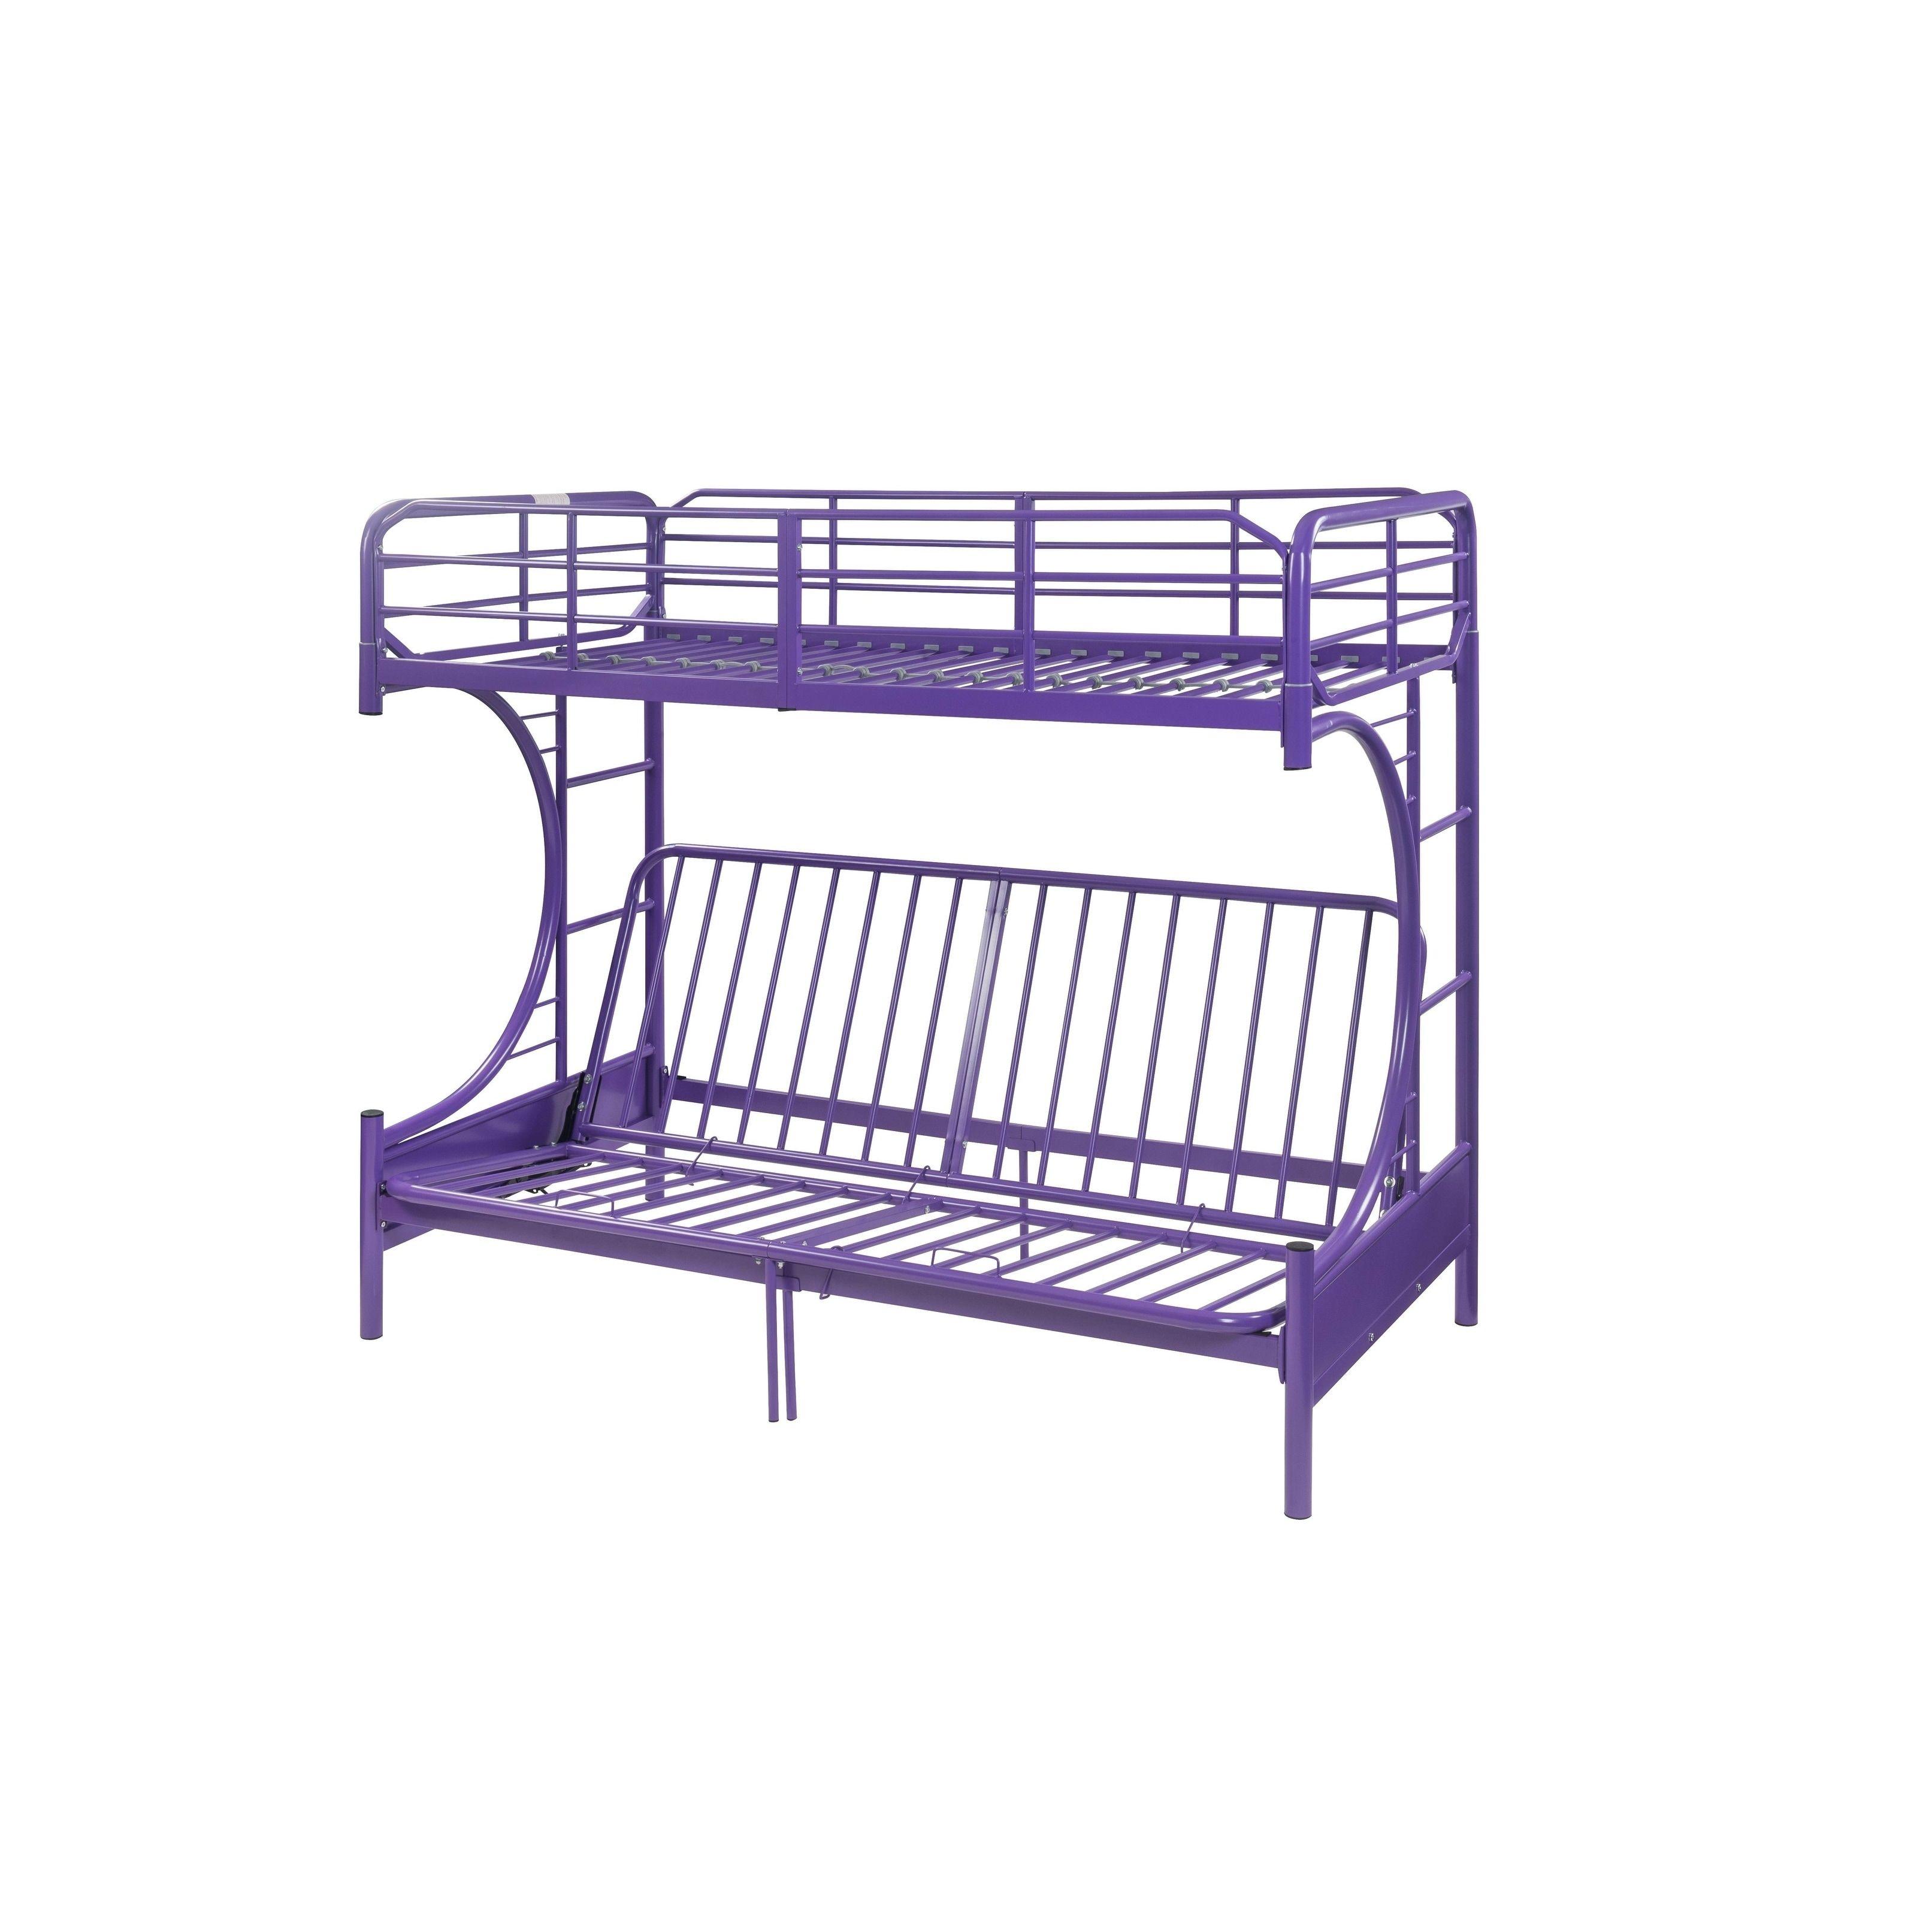 acme eclipse purpletwin over full futon bunk bed purple size twin